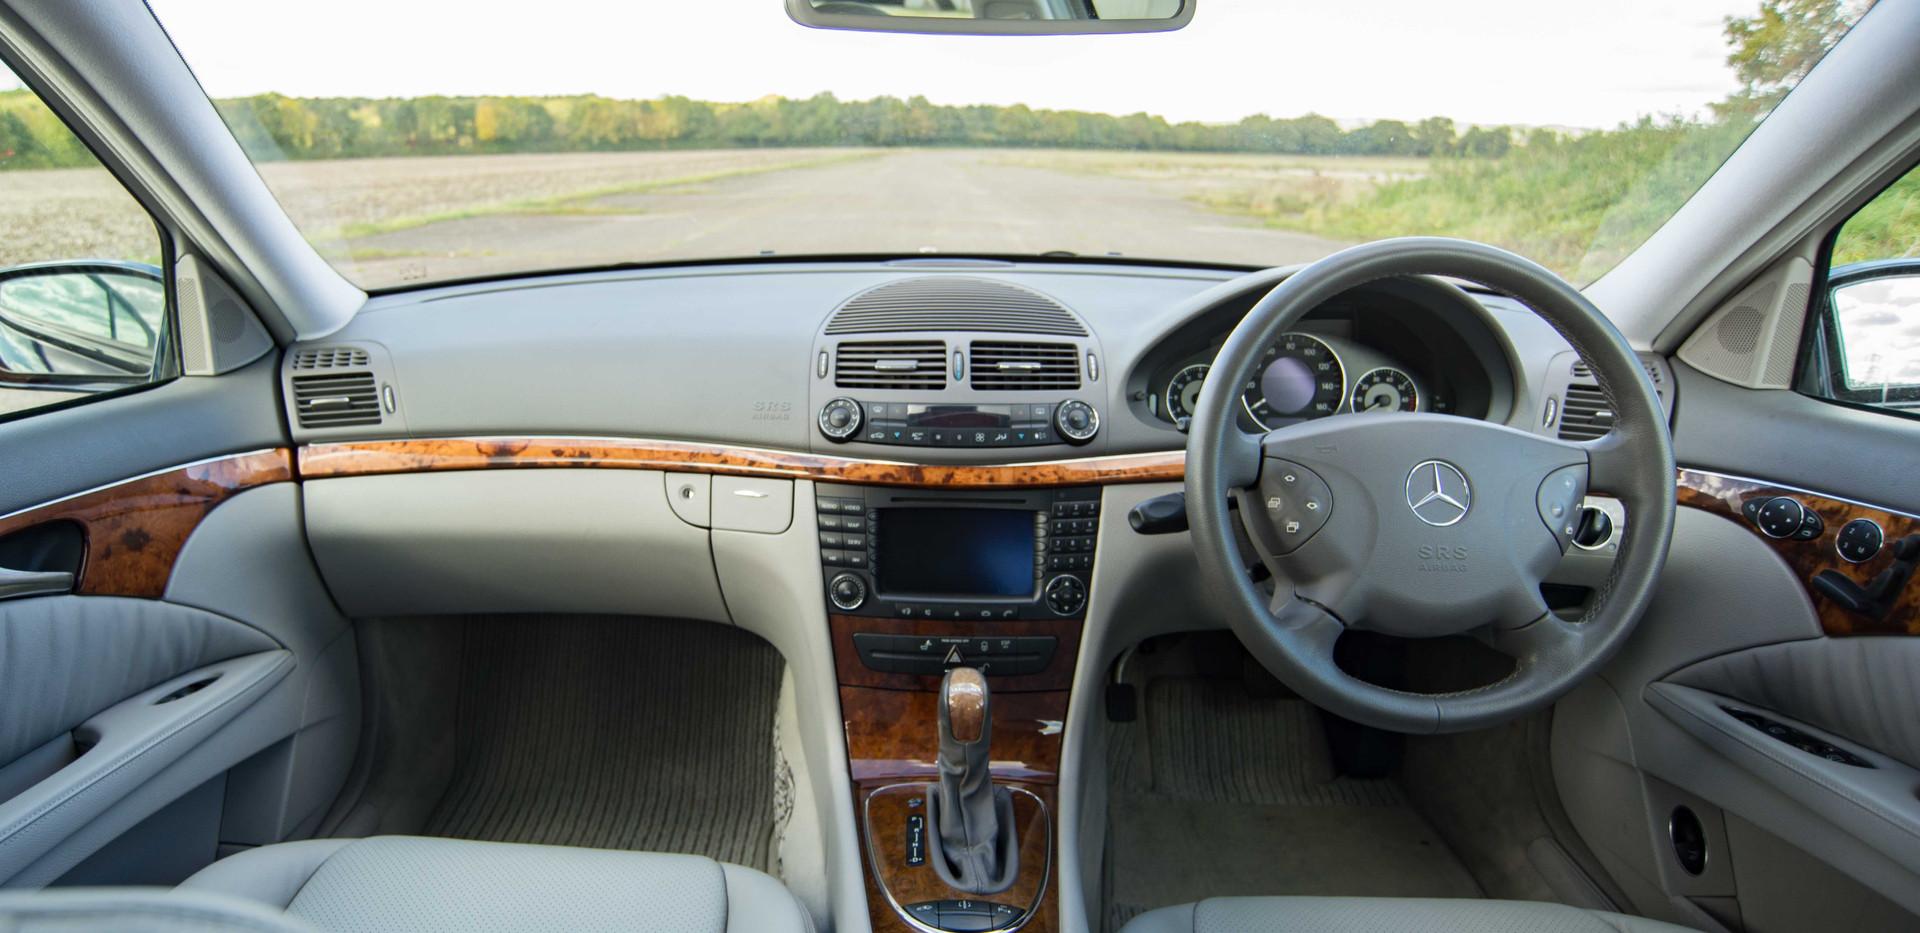 Mercedes E500 For Sale UK London  (45 of